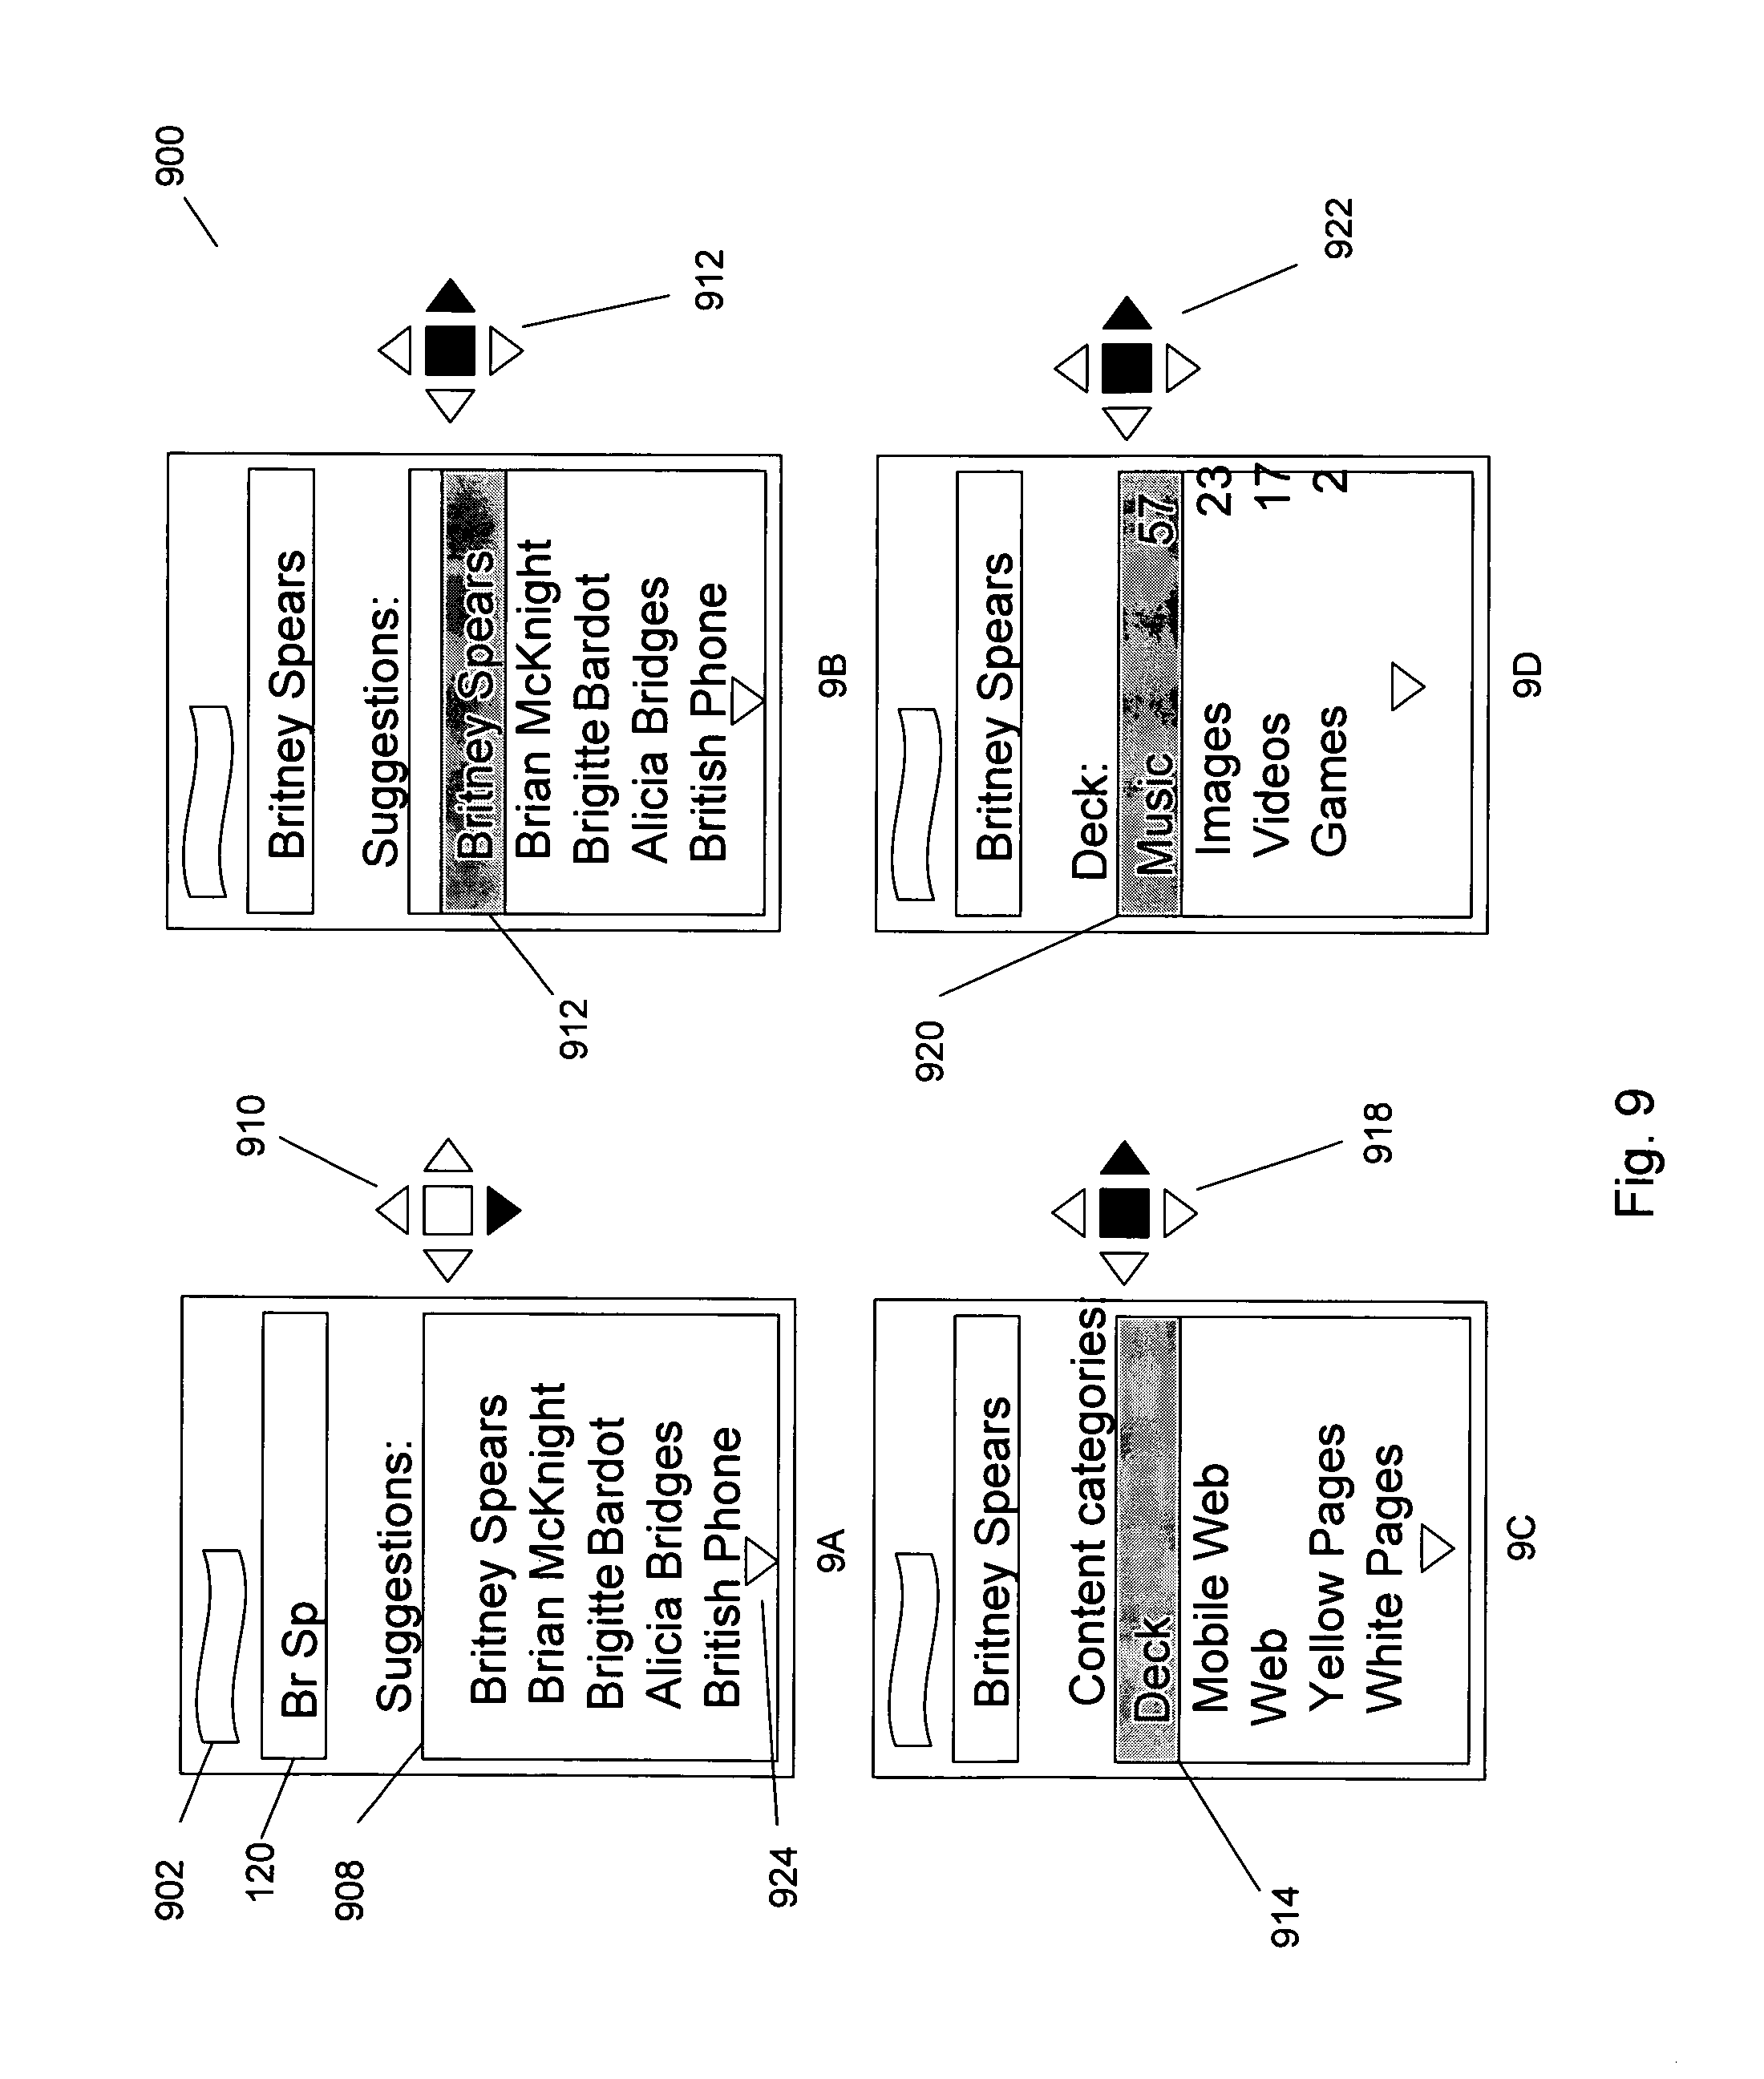 Patent US 10,038,756 B2